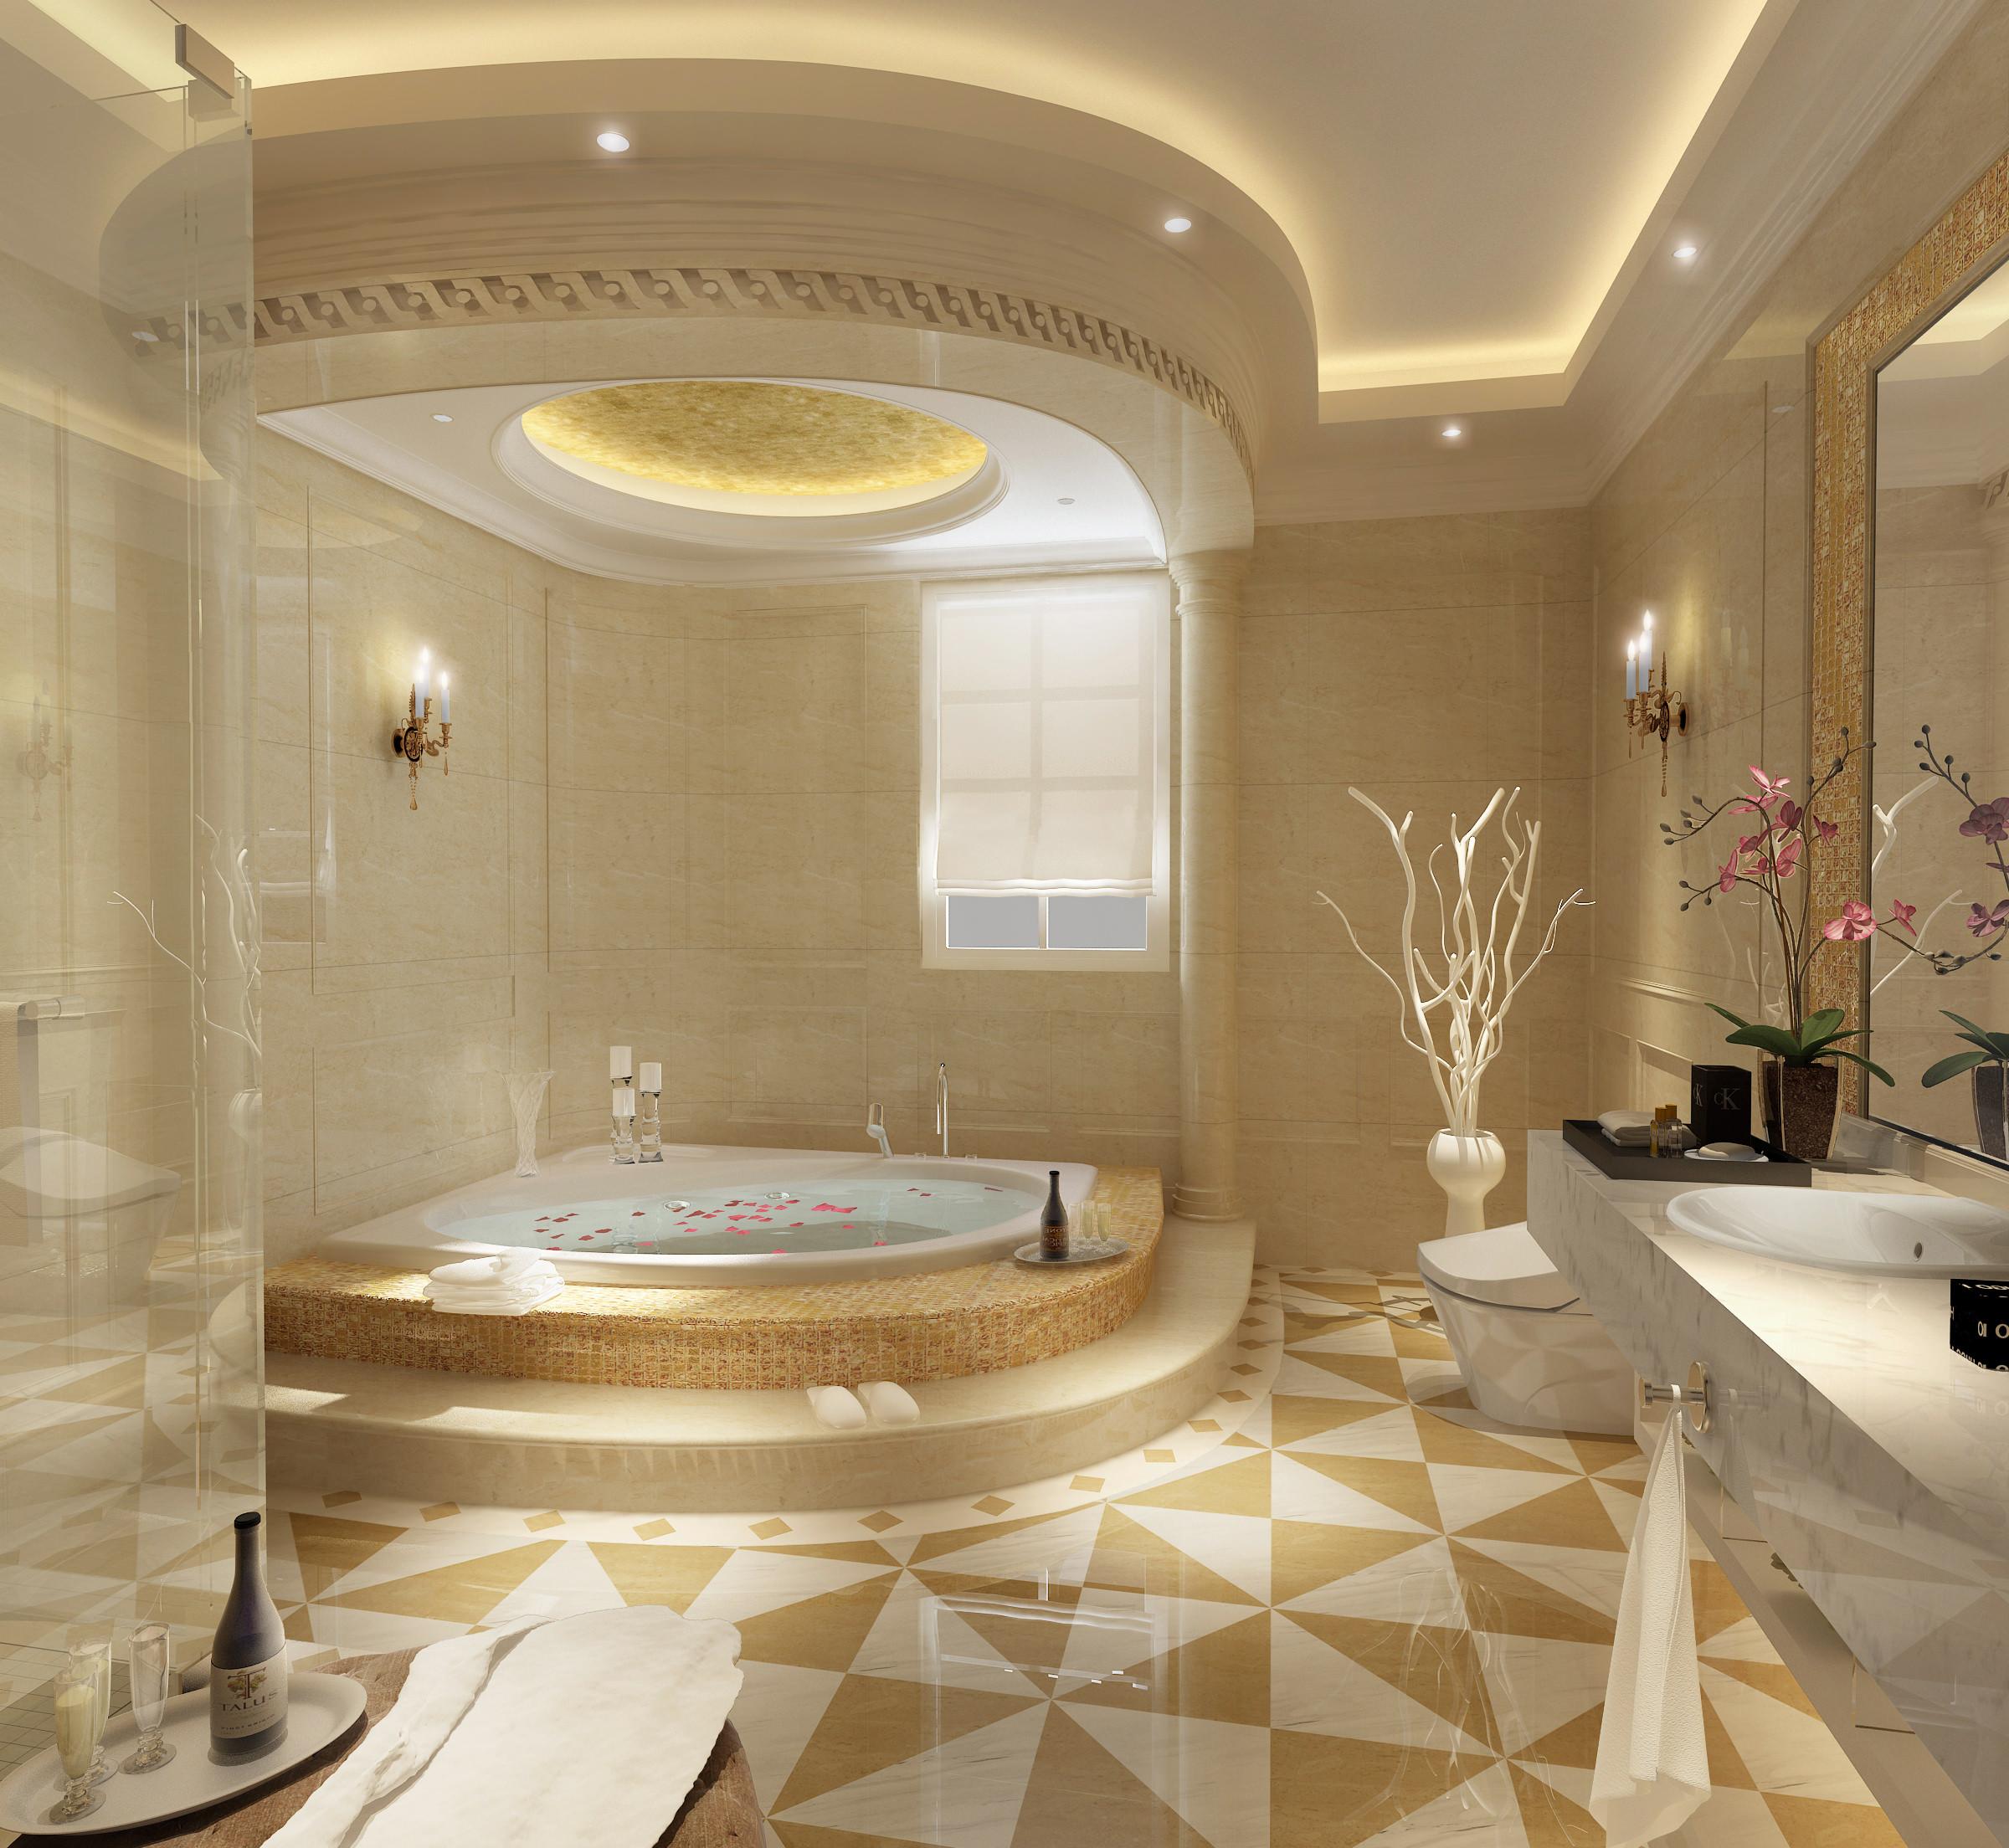 Luxury bathroom 3D Model MAX | CGTrader.com on Bathroom Model Design  id=48341